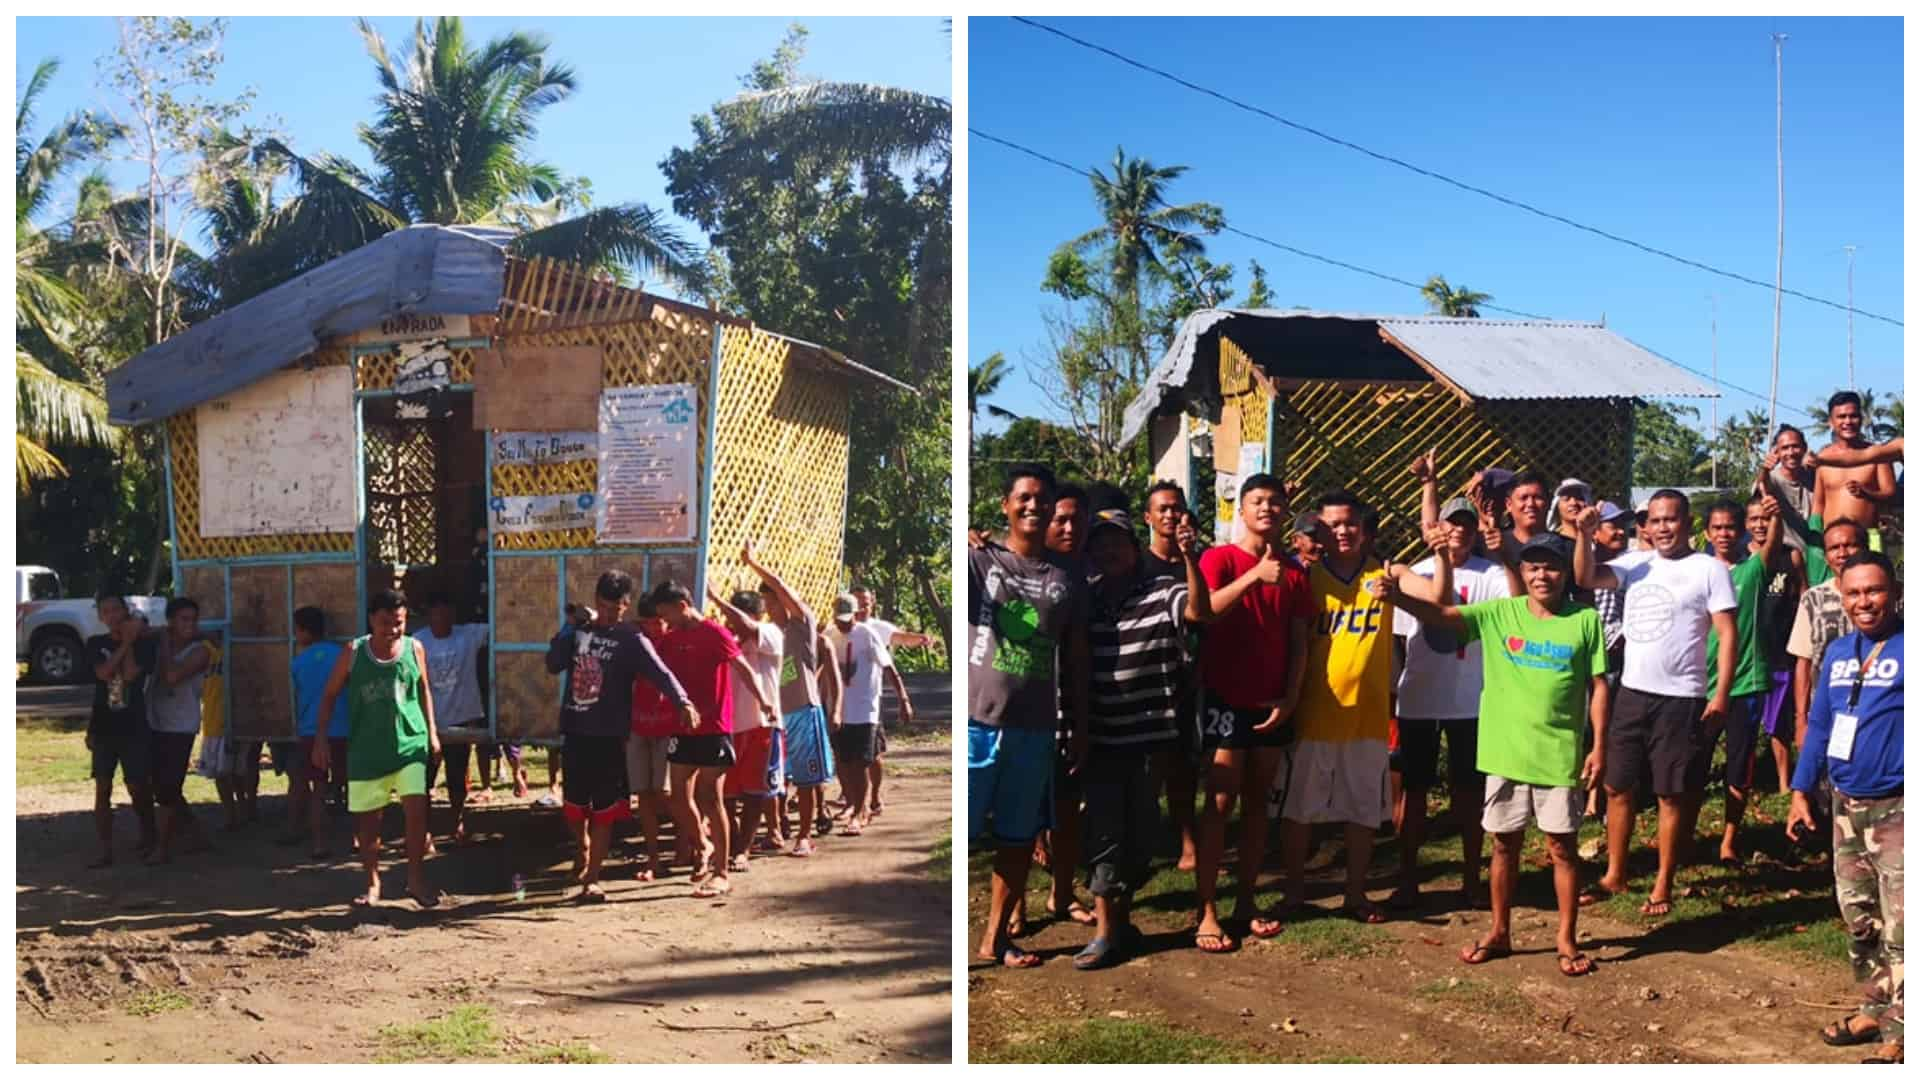 LOOK: Bayanihan Spirit seen in Medellin, Cebu | Sugbo.ph ...